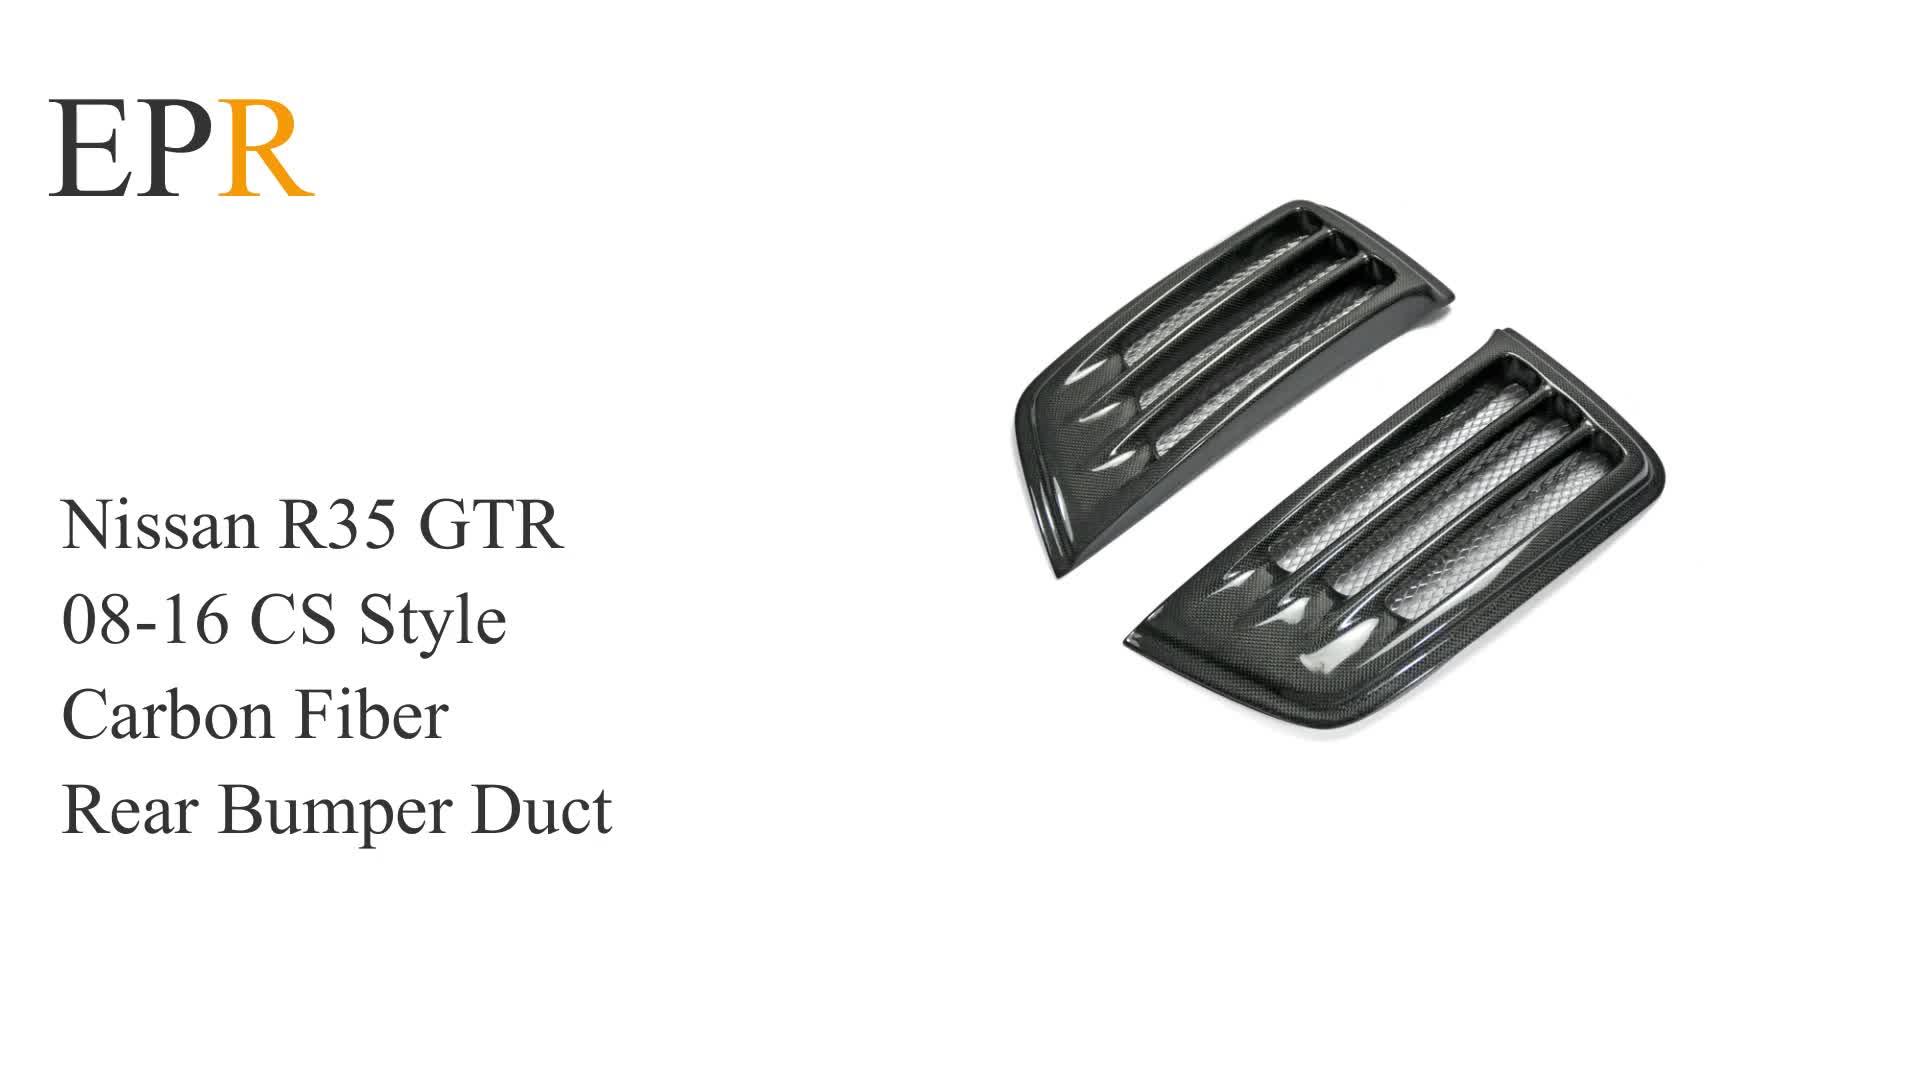 R35 Gtr 08 16 Carbon Fiber Cs Style Rear Bumper Duct